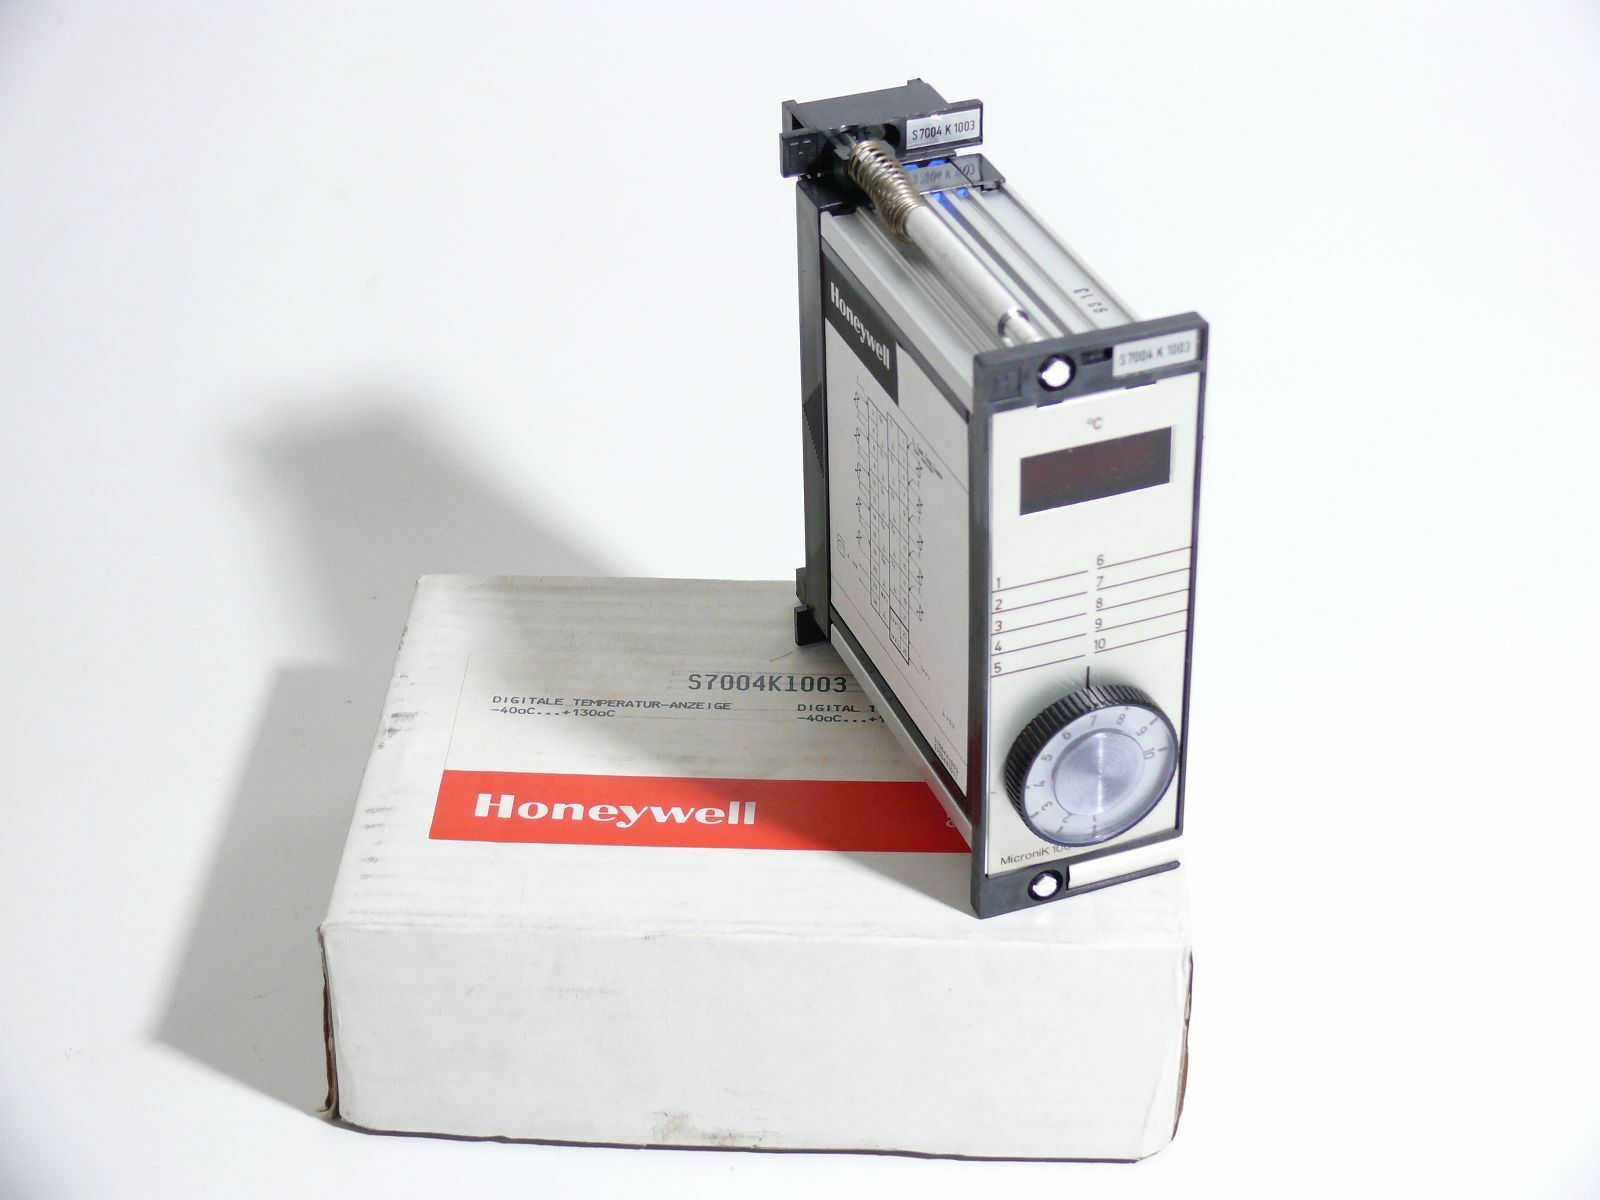 HONEYWELL Digitale Temperatur-Anzeige Micronik S7004K1003